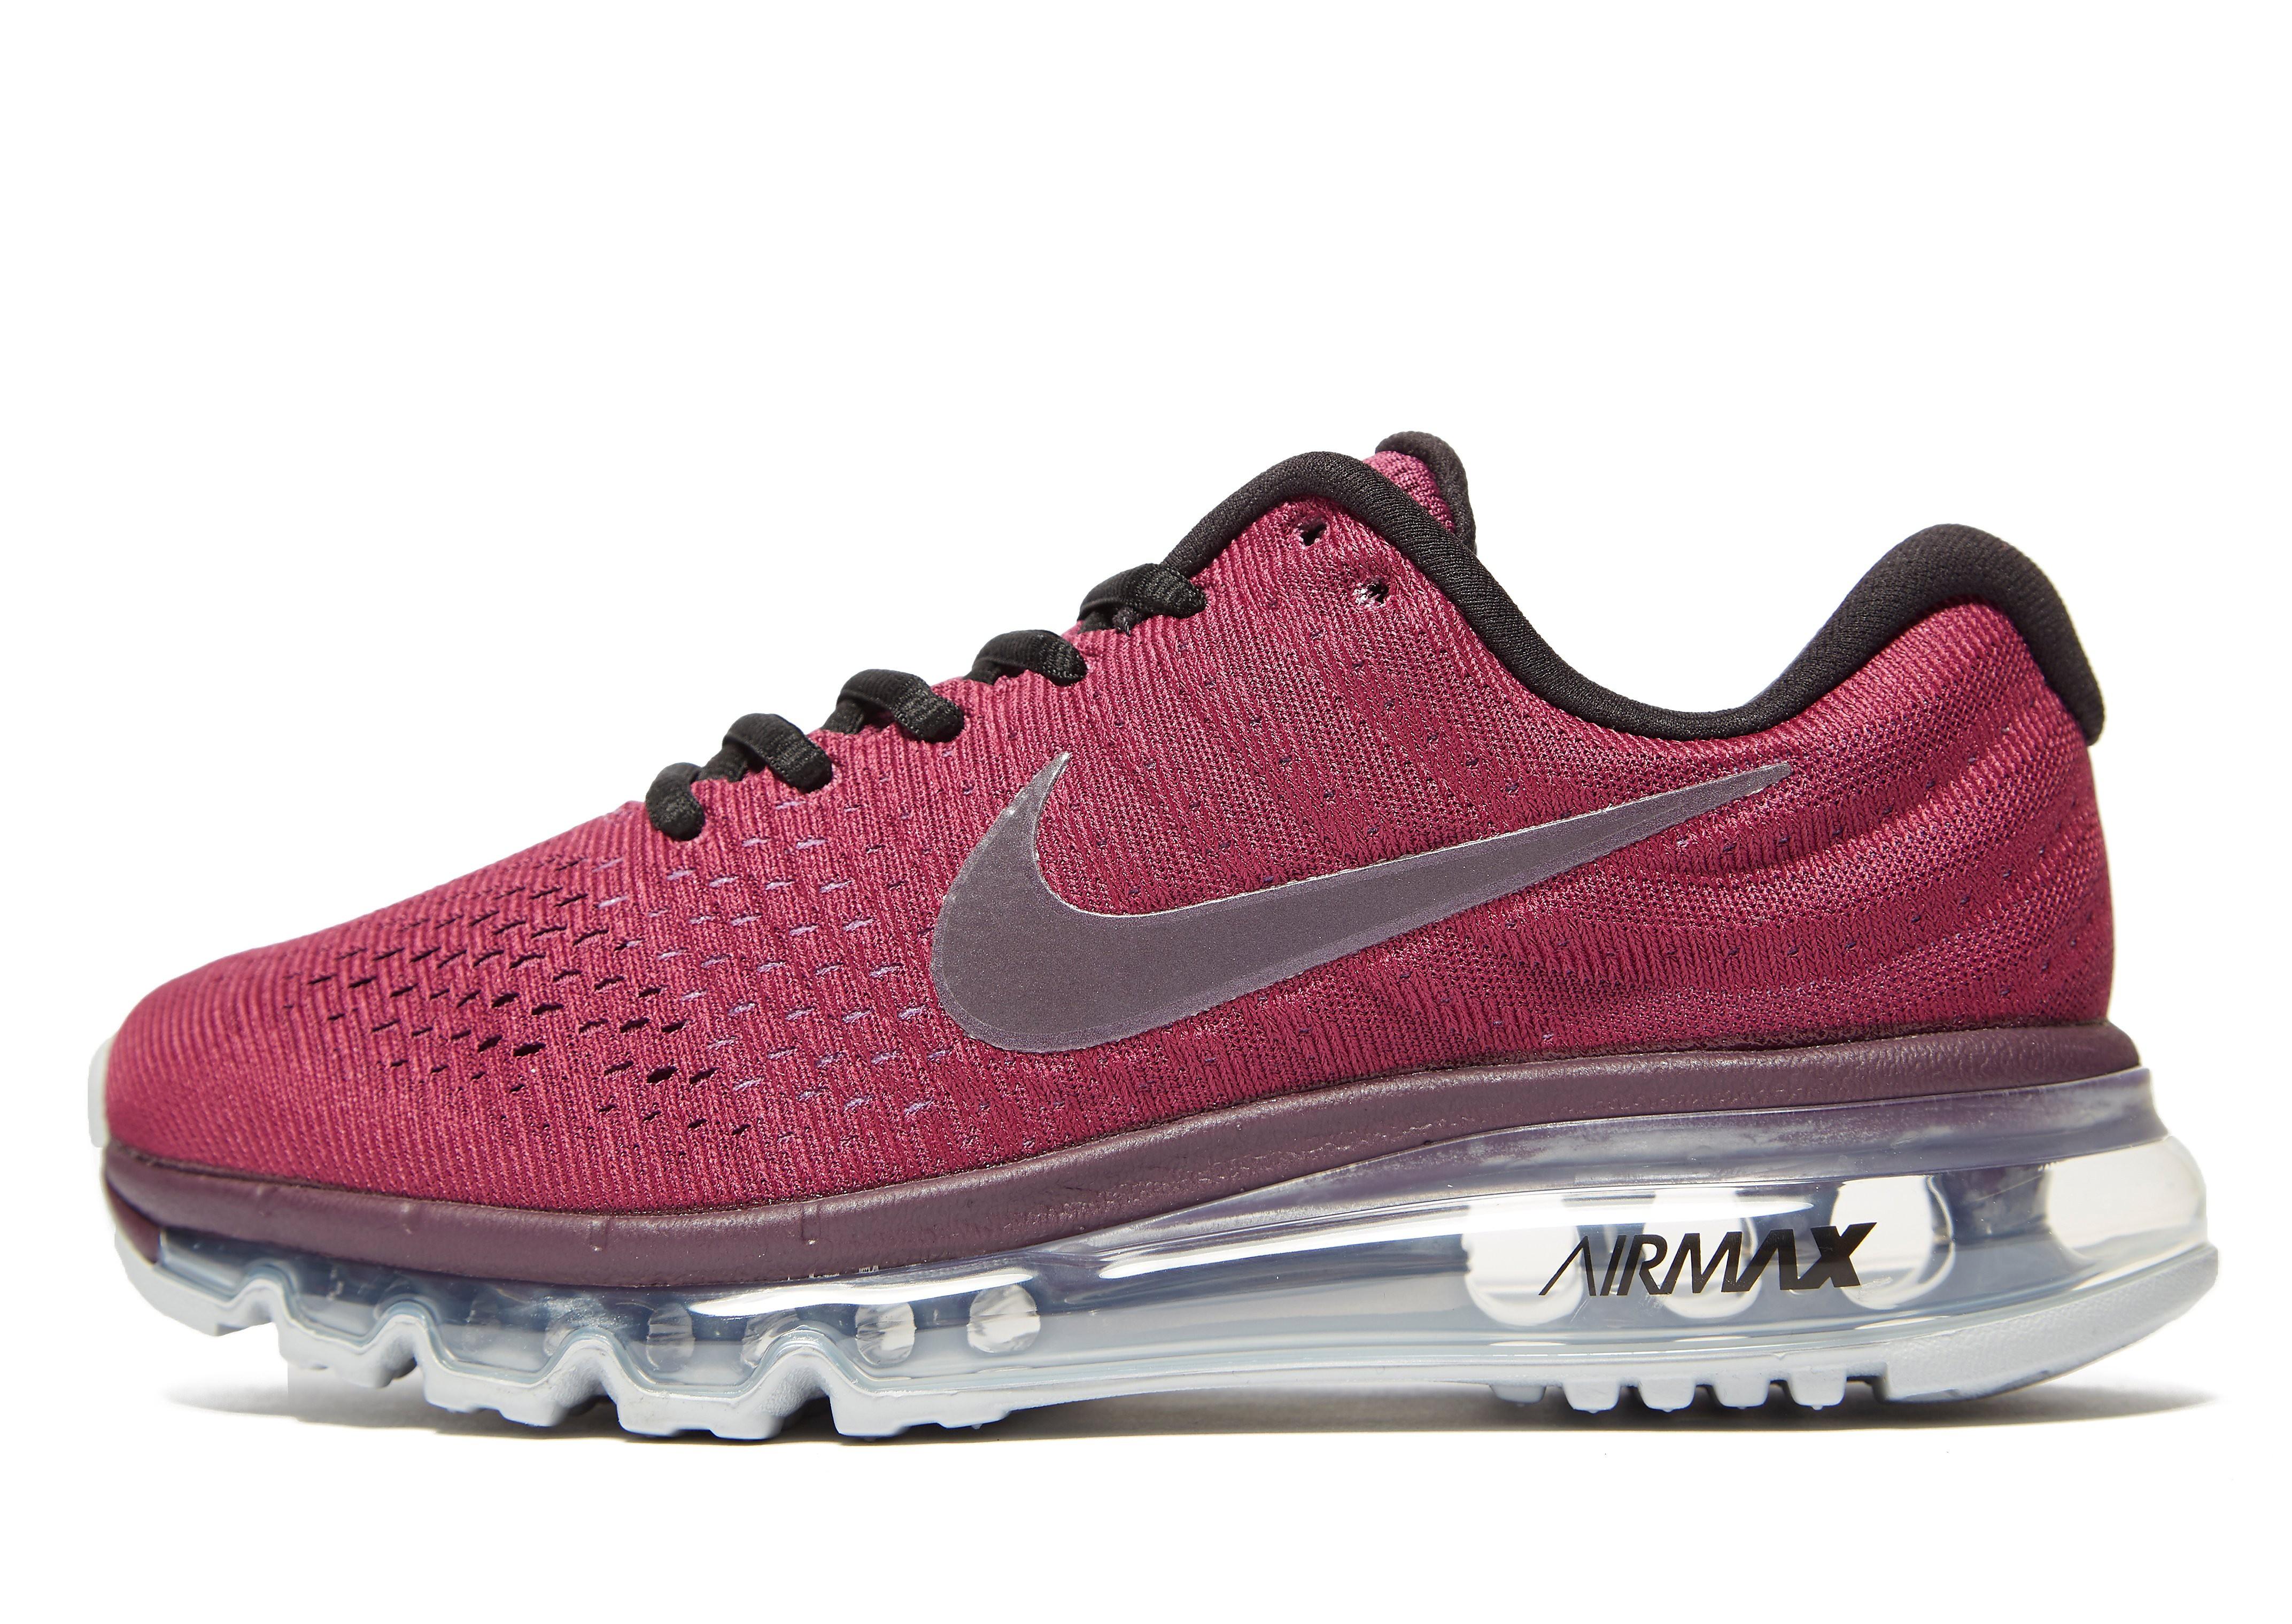 Nike Air Max 2017 Women's